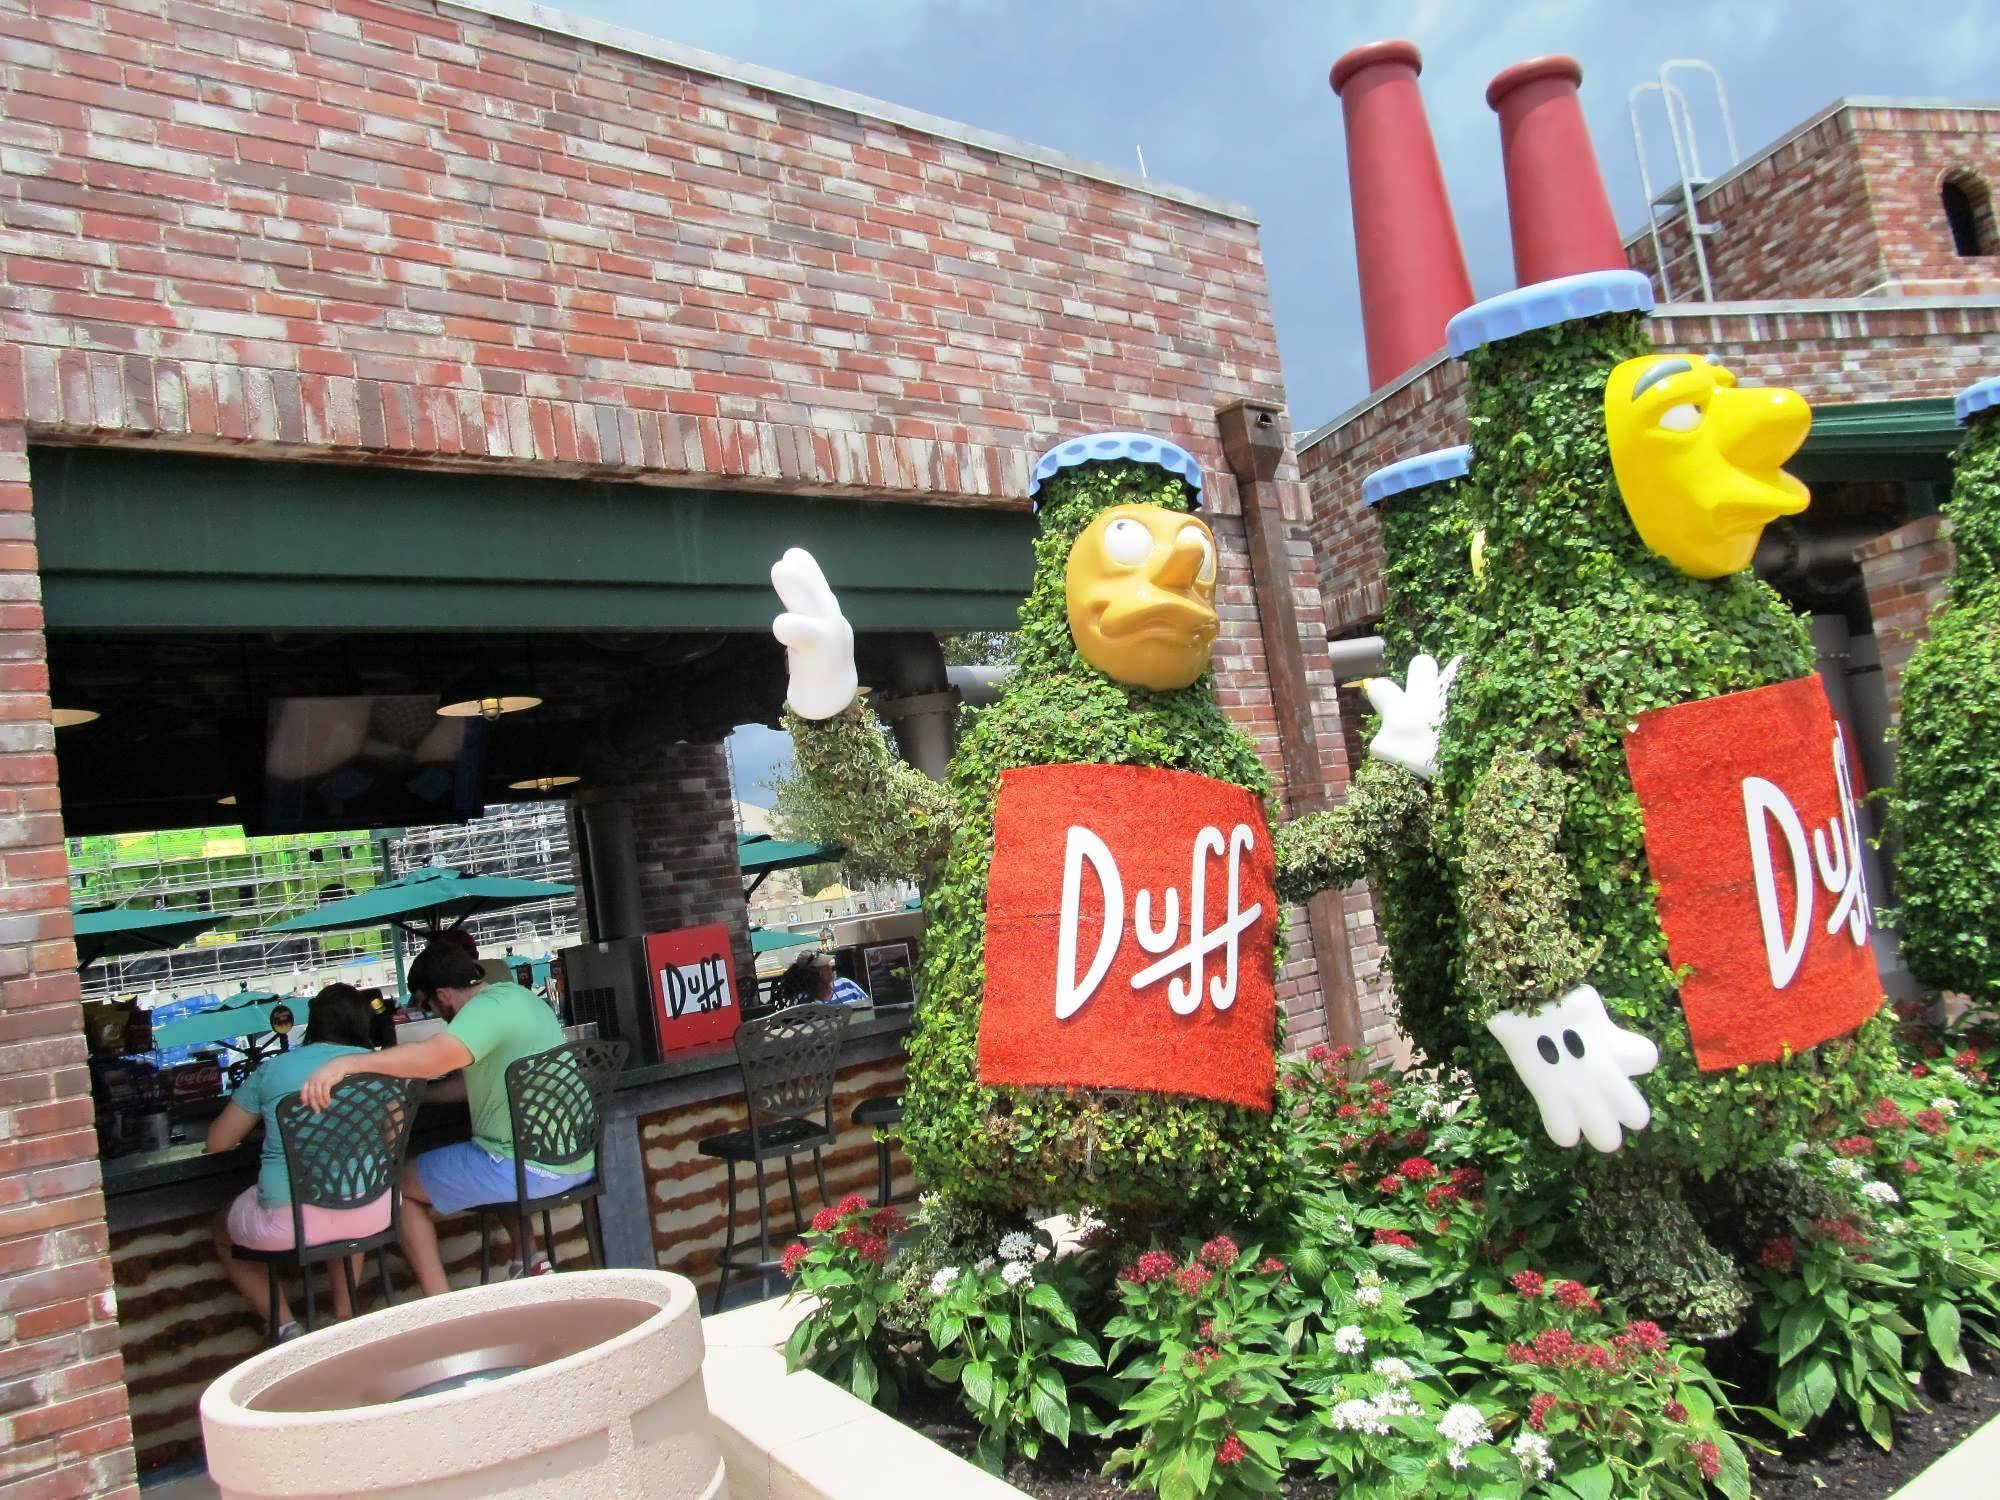 duff gardens universal orlando